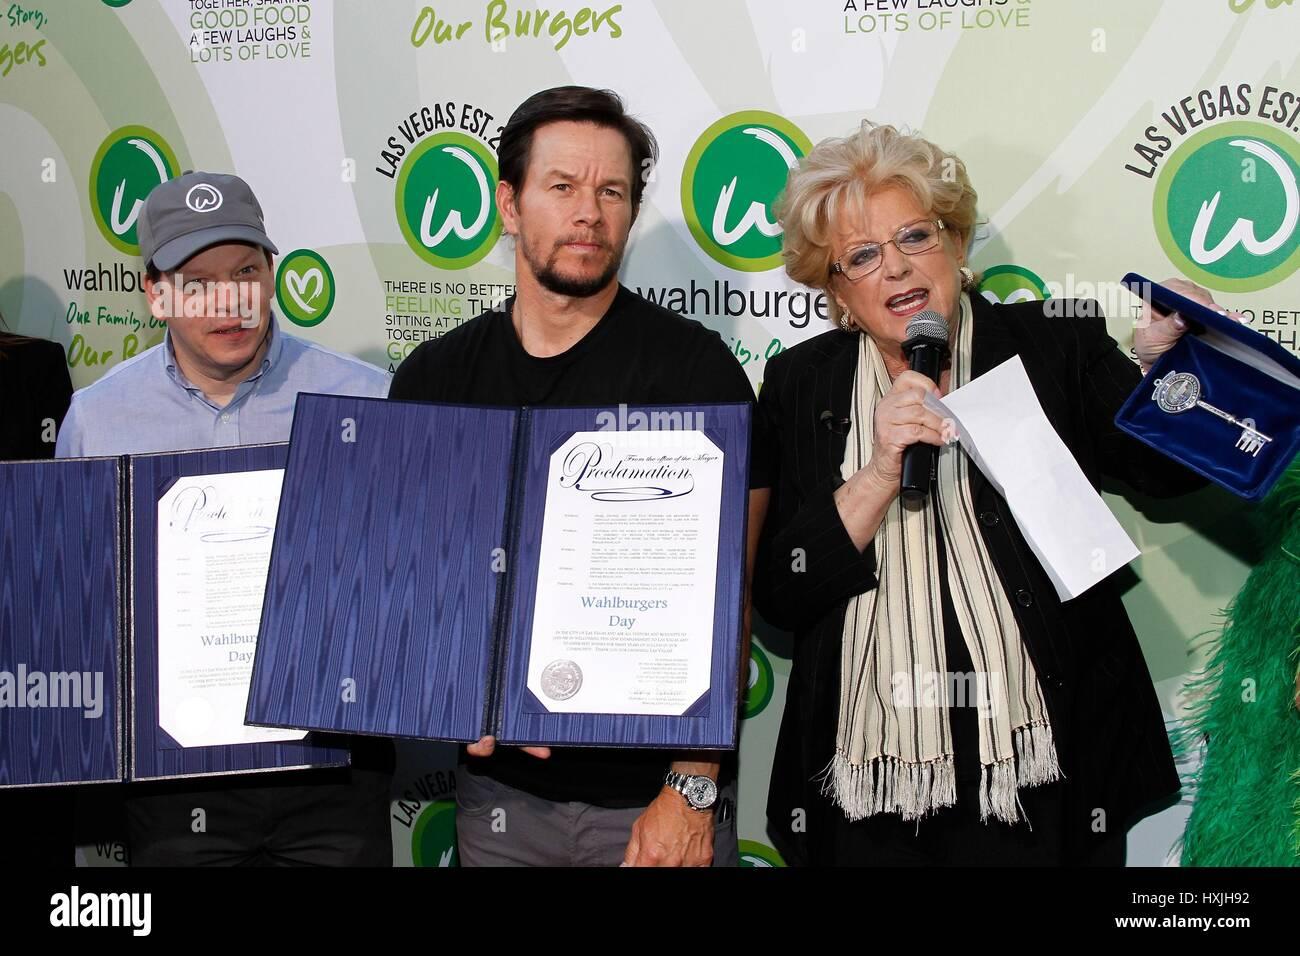 Las Vegas, NV, USA. Mar 28, 2017. Paul Wahlberg, Mark Wahlberg, Caroline Goodman (Maire de Las Vegas) présents Photo Stock